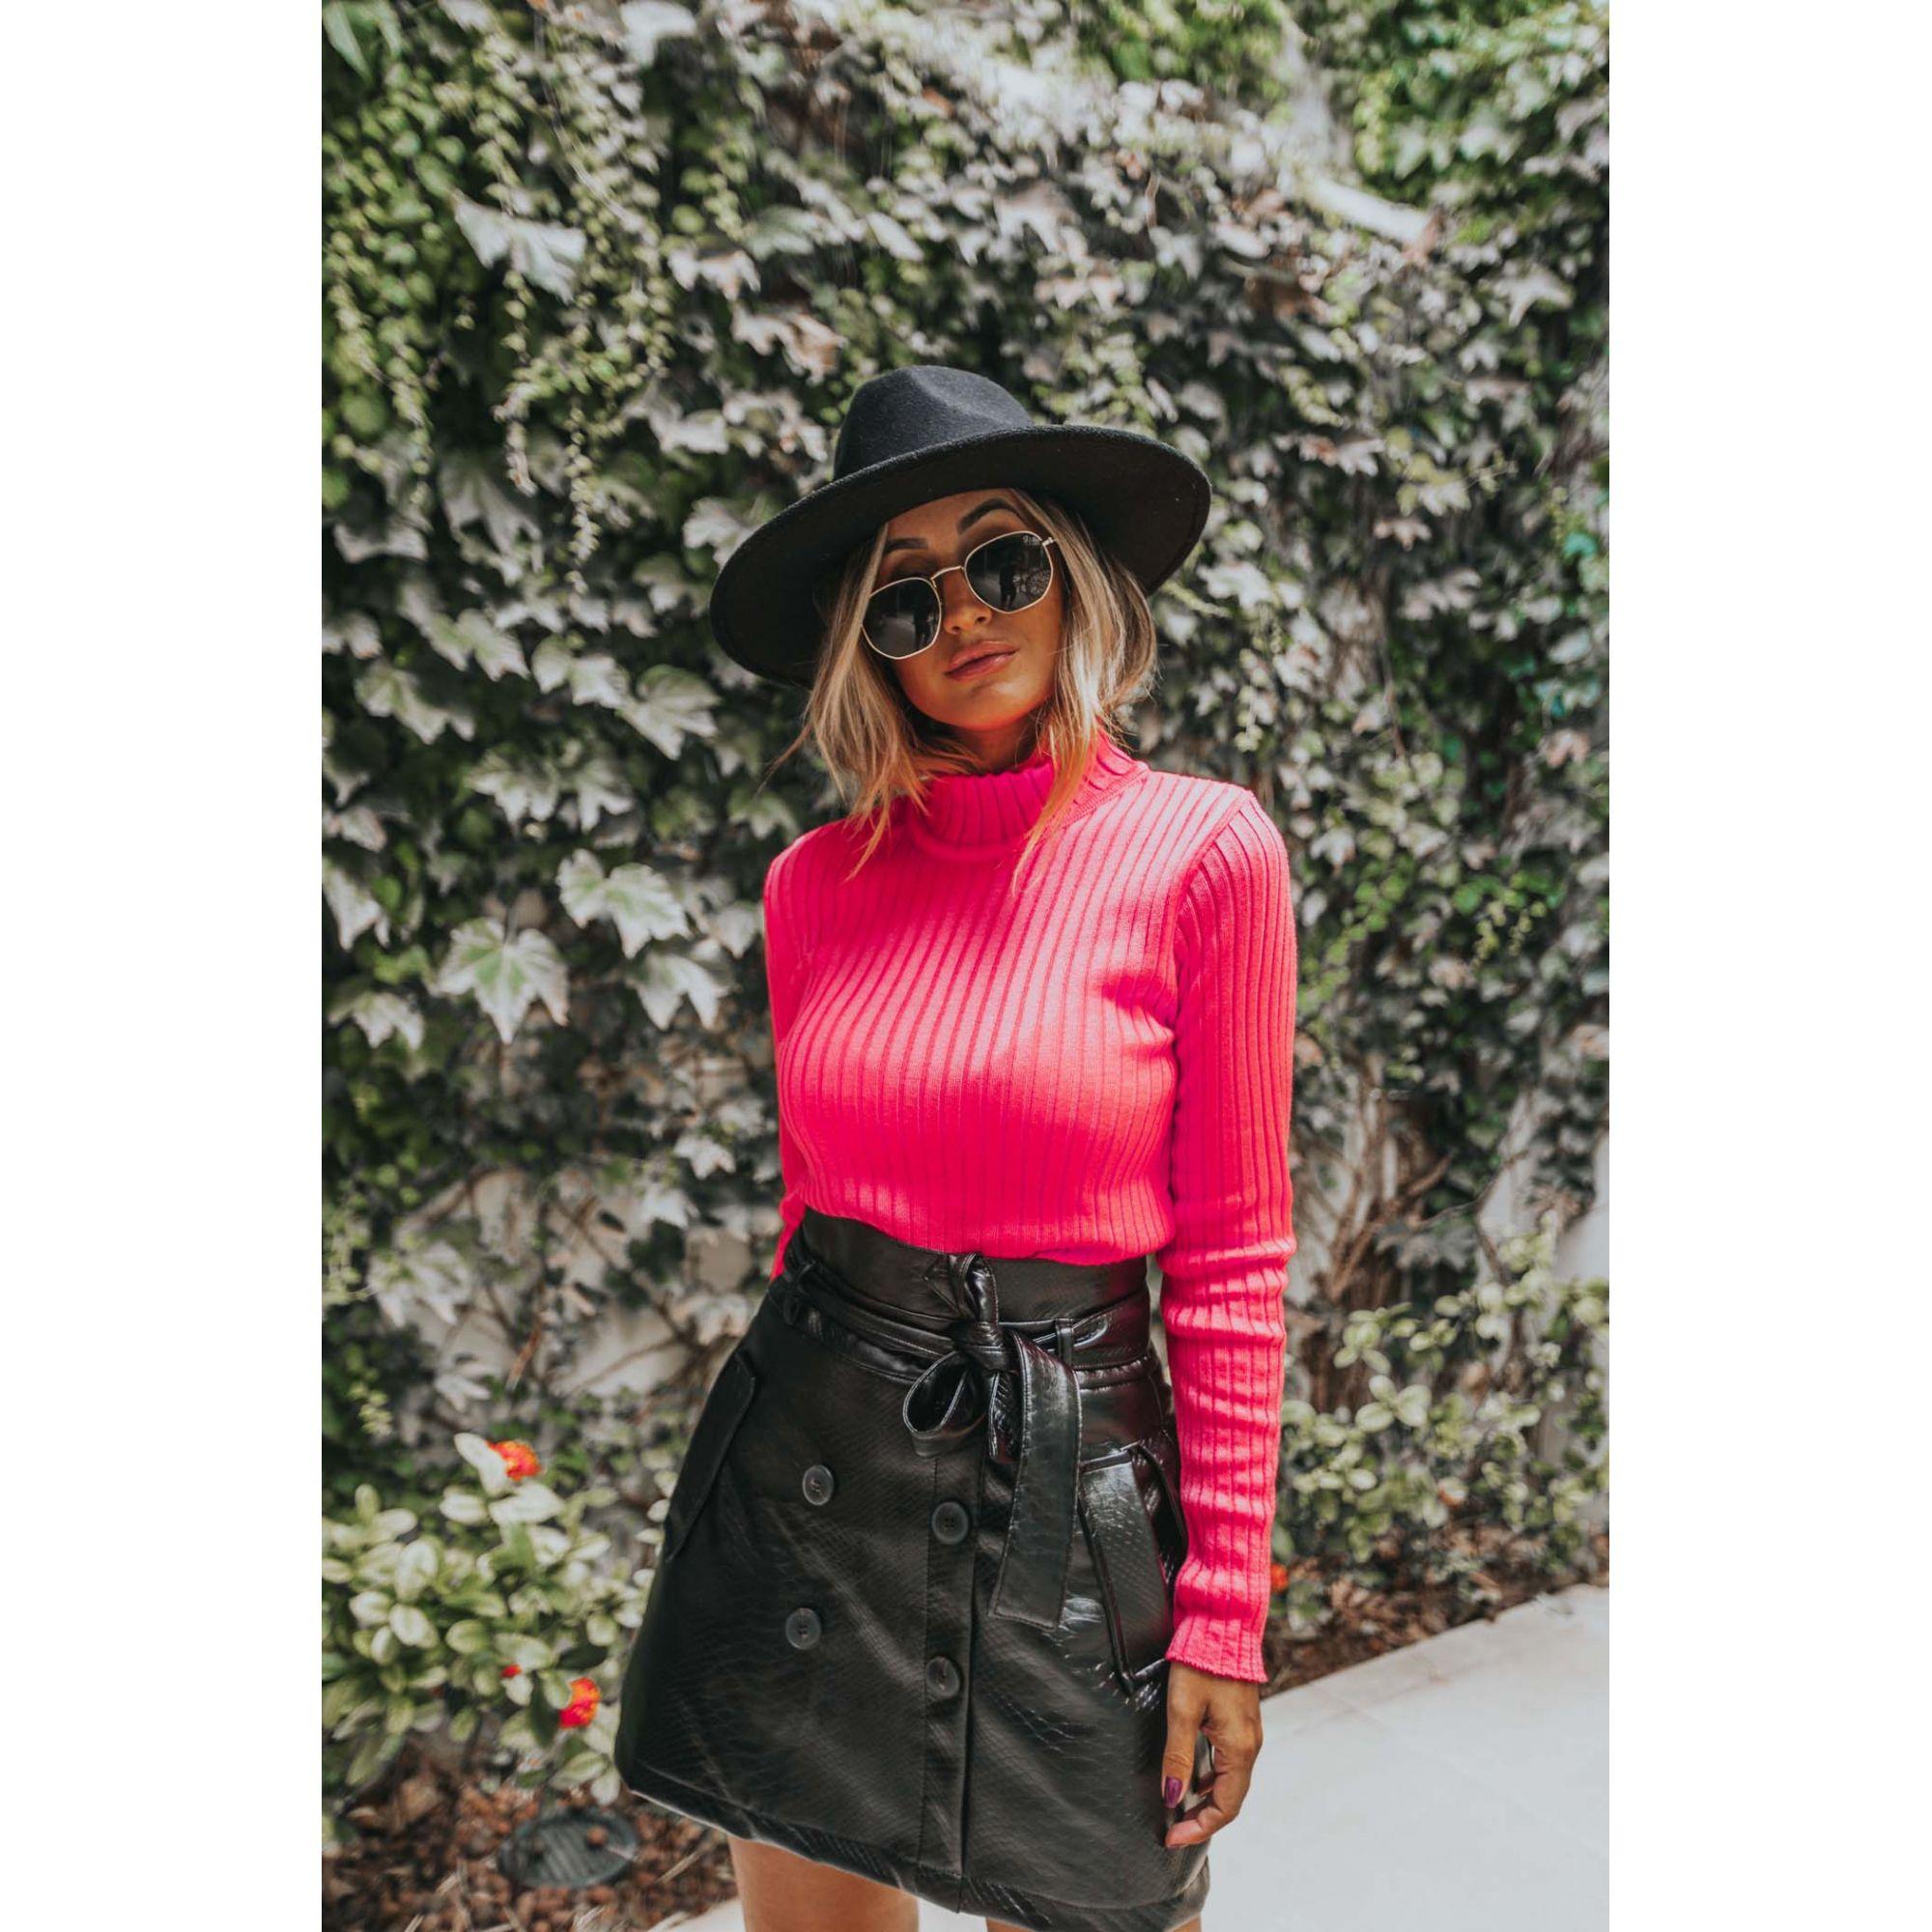 Blusa Vera Tricot Cacharrel Feminino Pink Neon